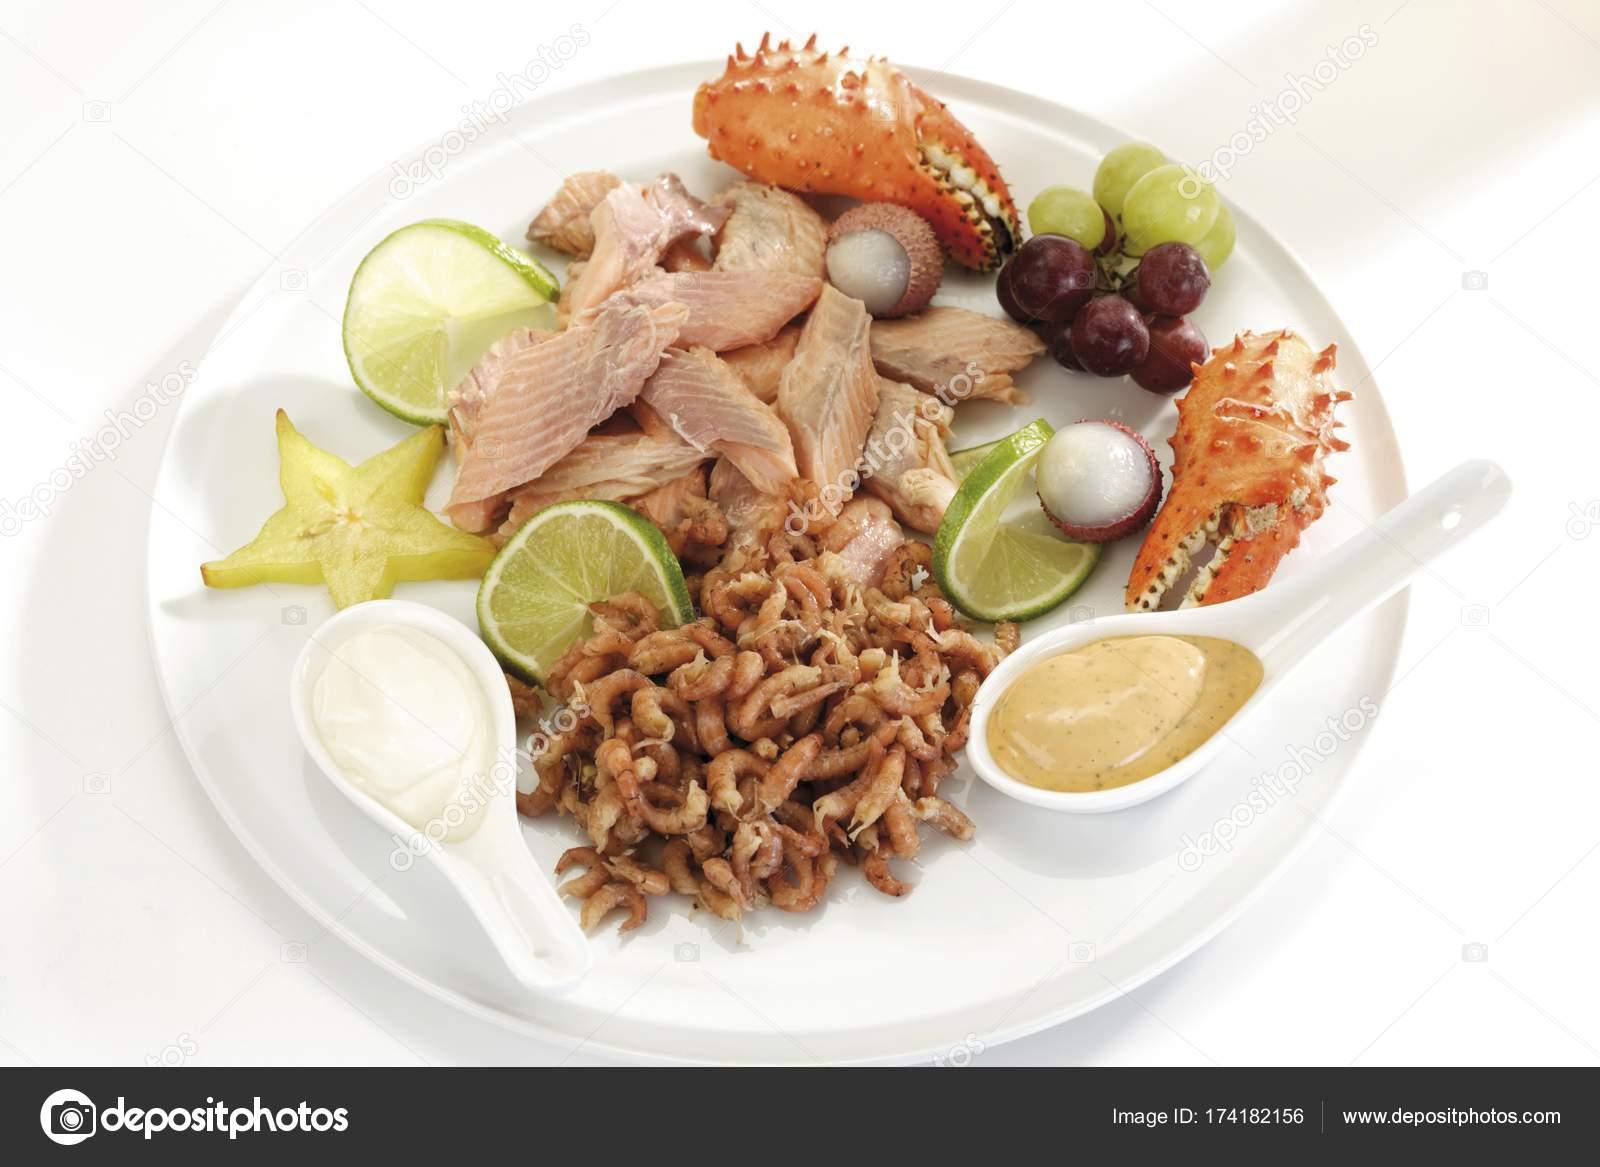 Fancy Fish Platter Smoked Salmon Filet Shrimps Crab Pincers Fruits Stock Photo C Imagebrokermicrostock 174182156